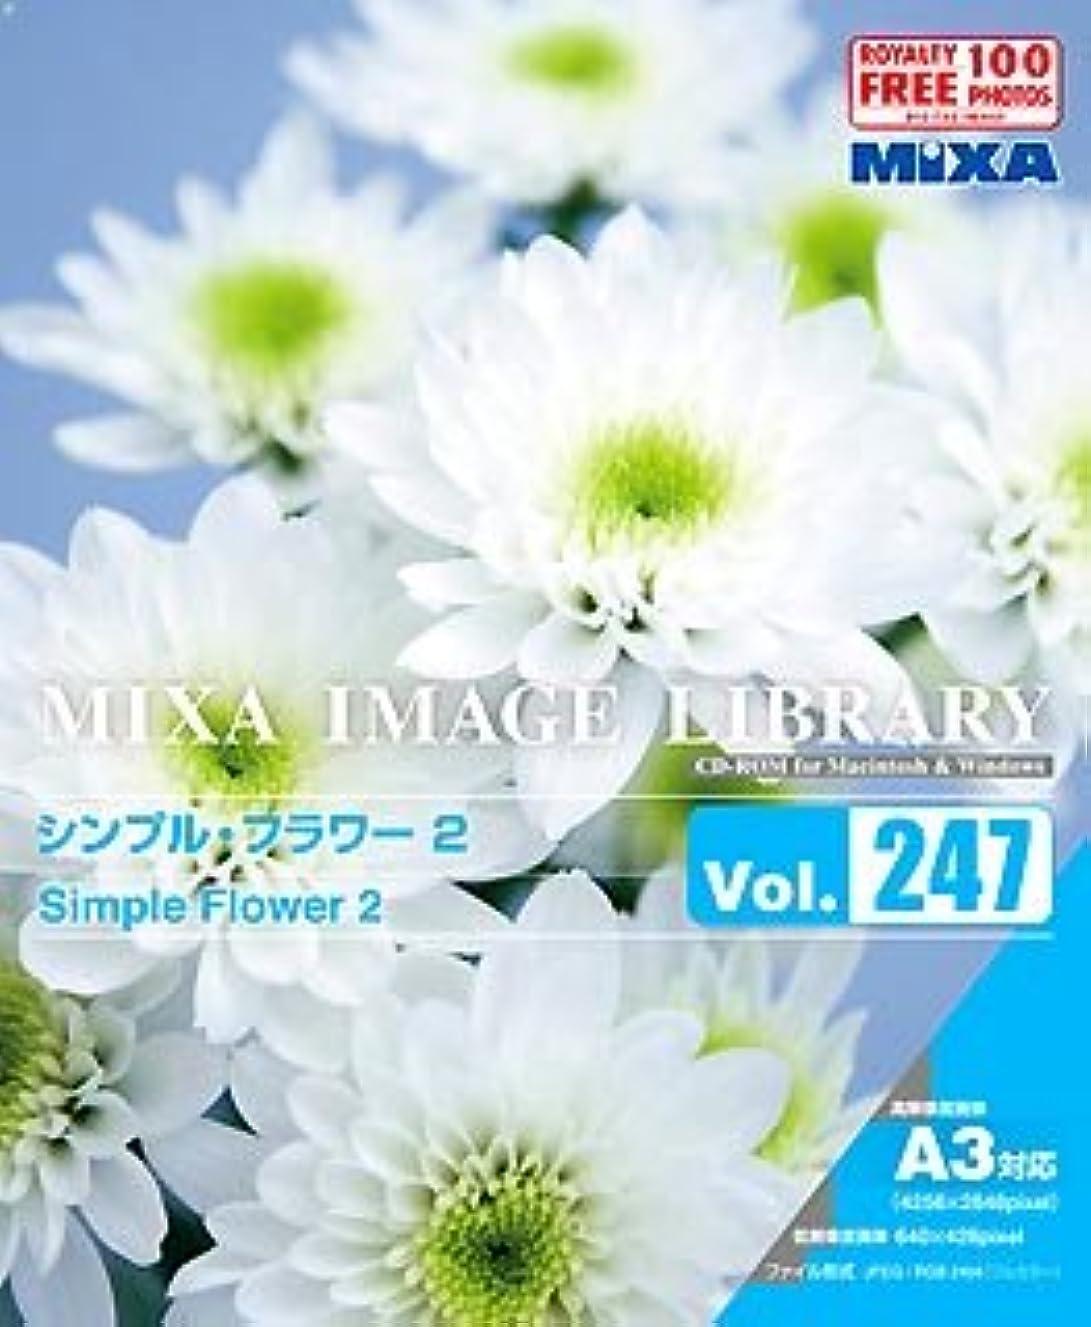 MIXA IMAGE LIBRARY Vol.247 シンプル?フラワー2